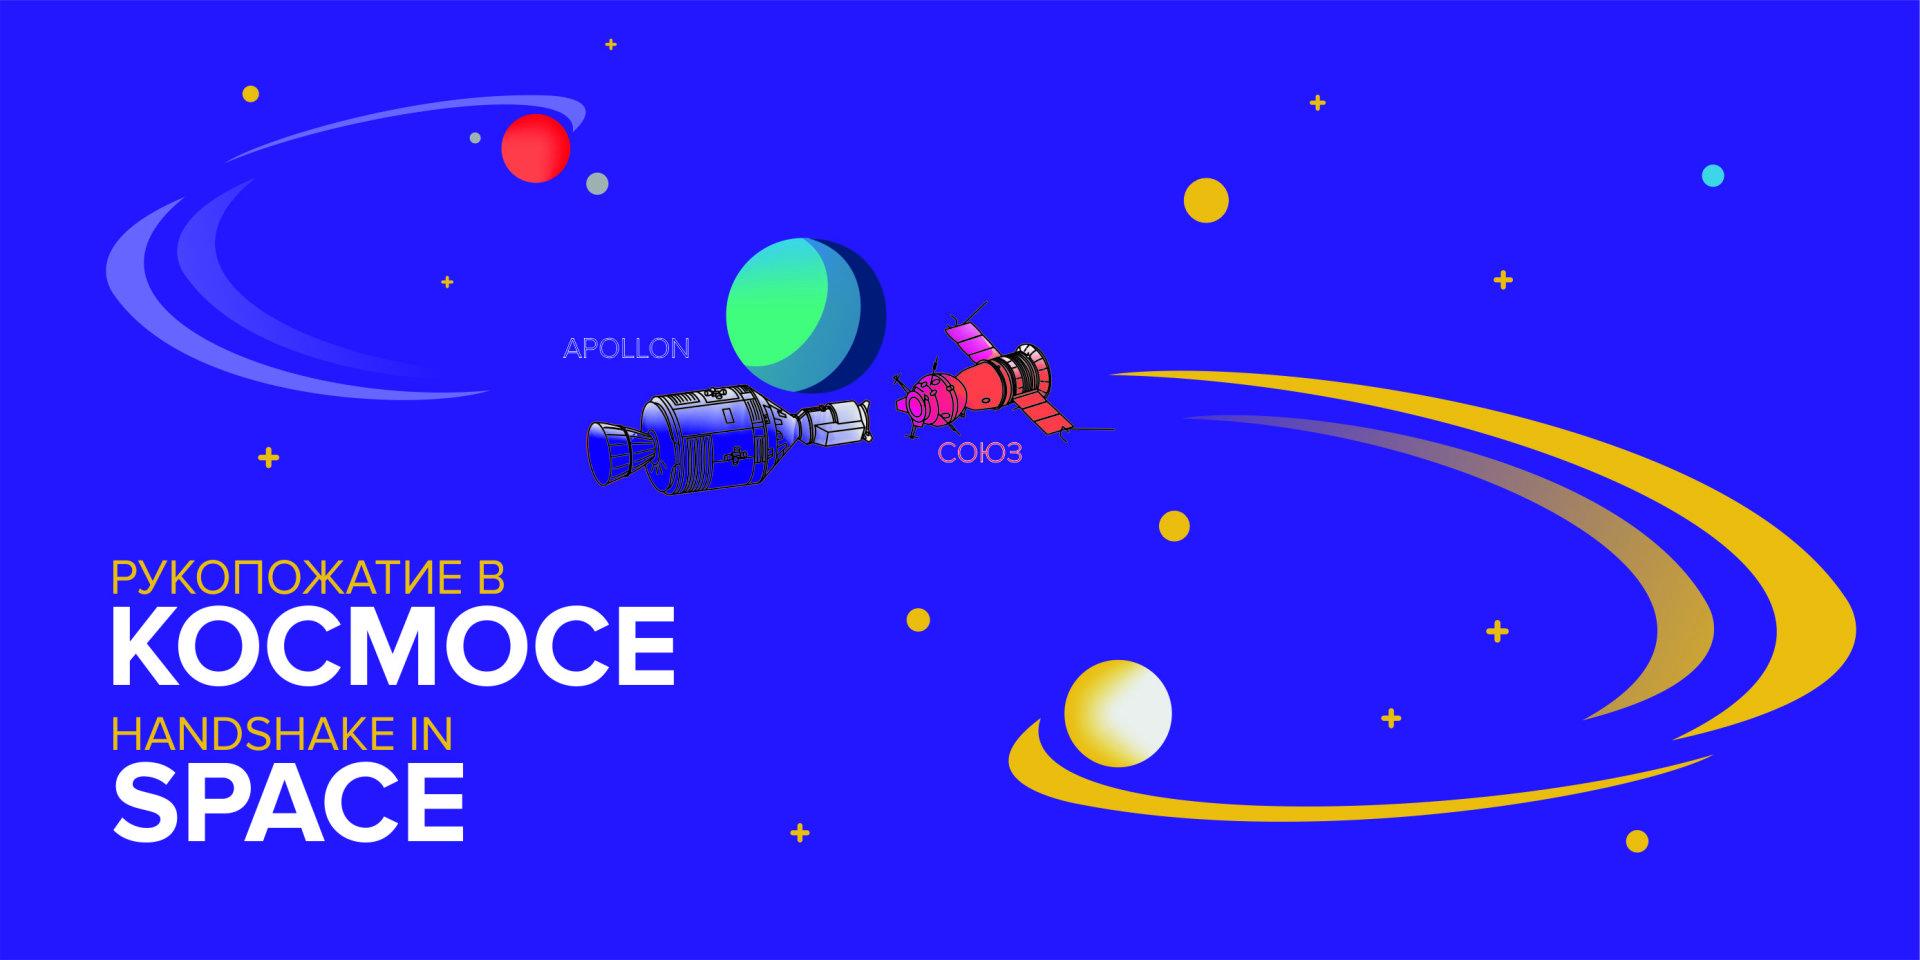 Рукопожатие в космосе-картинка